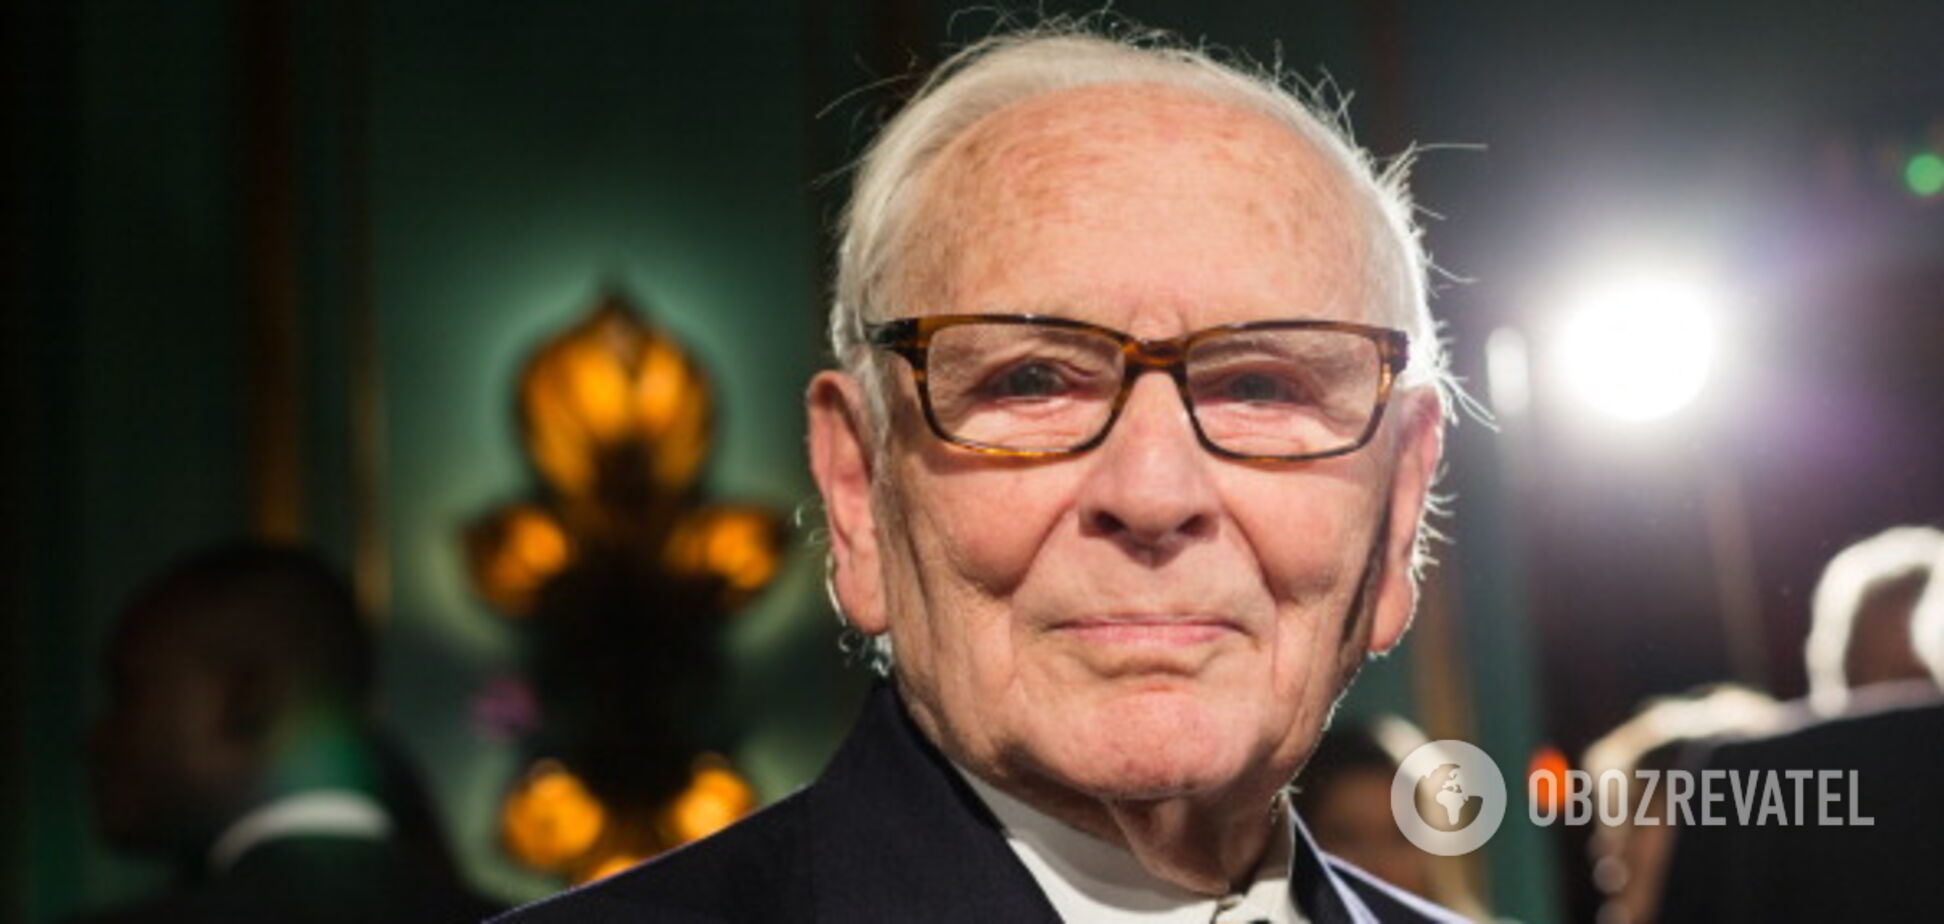 П'єр Карден помер на 99-му році життя